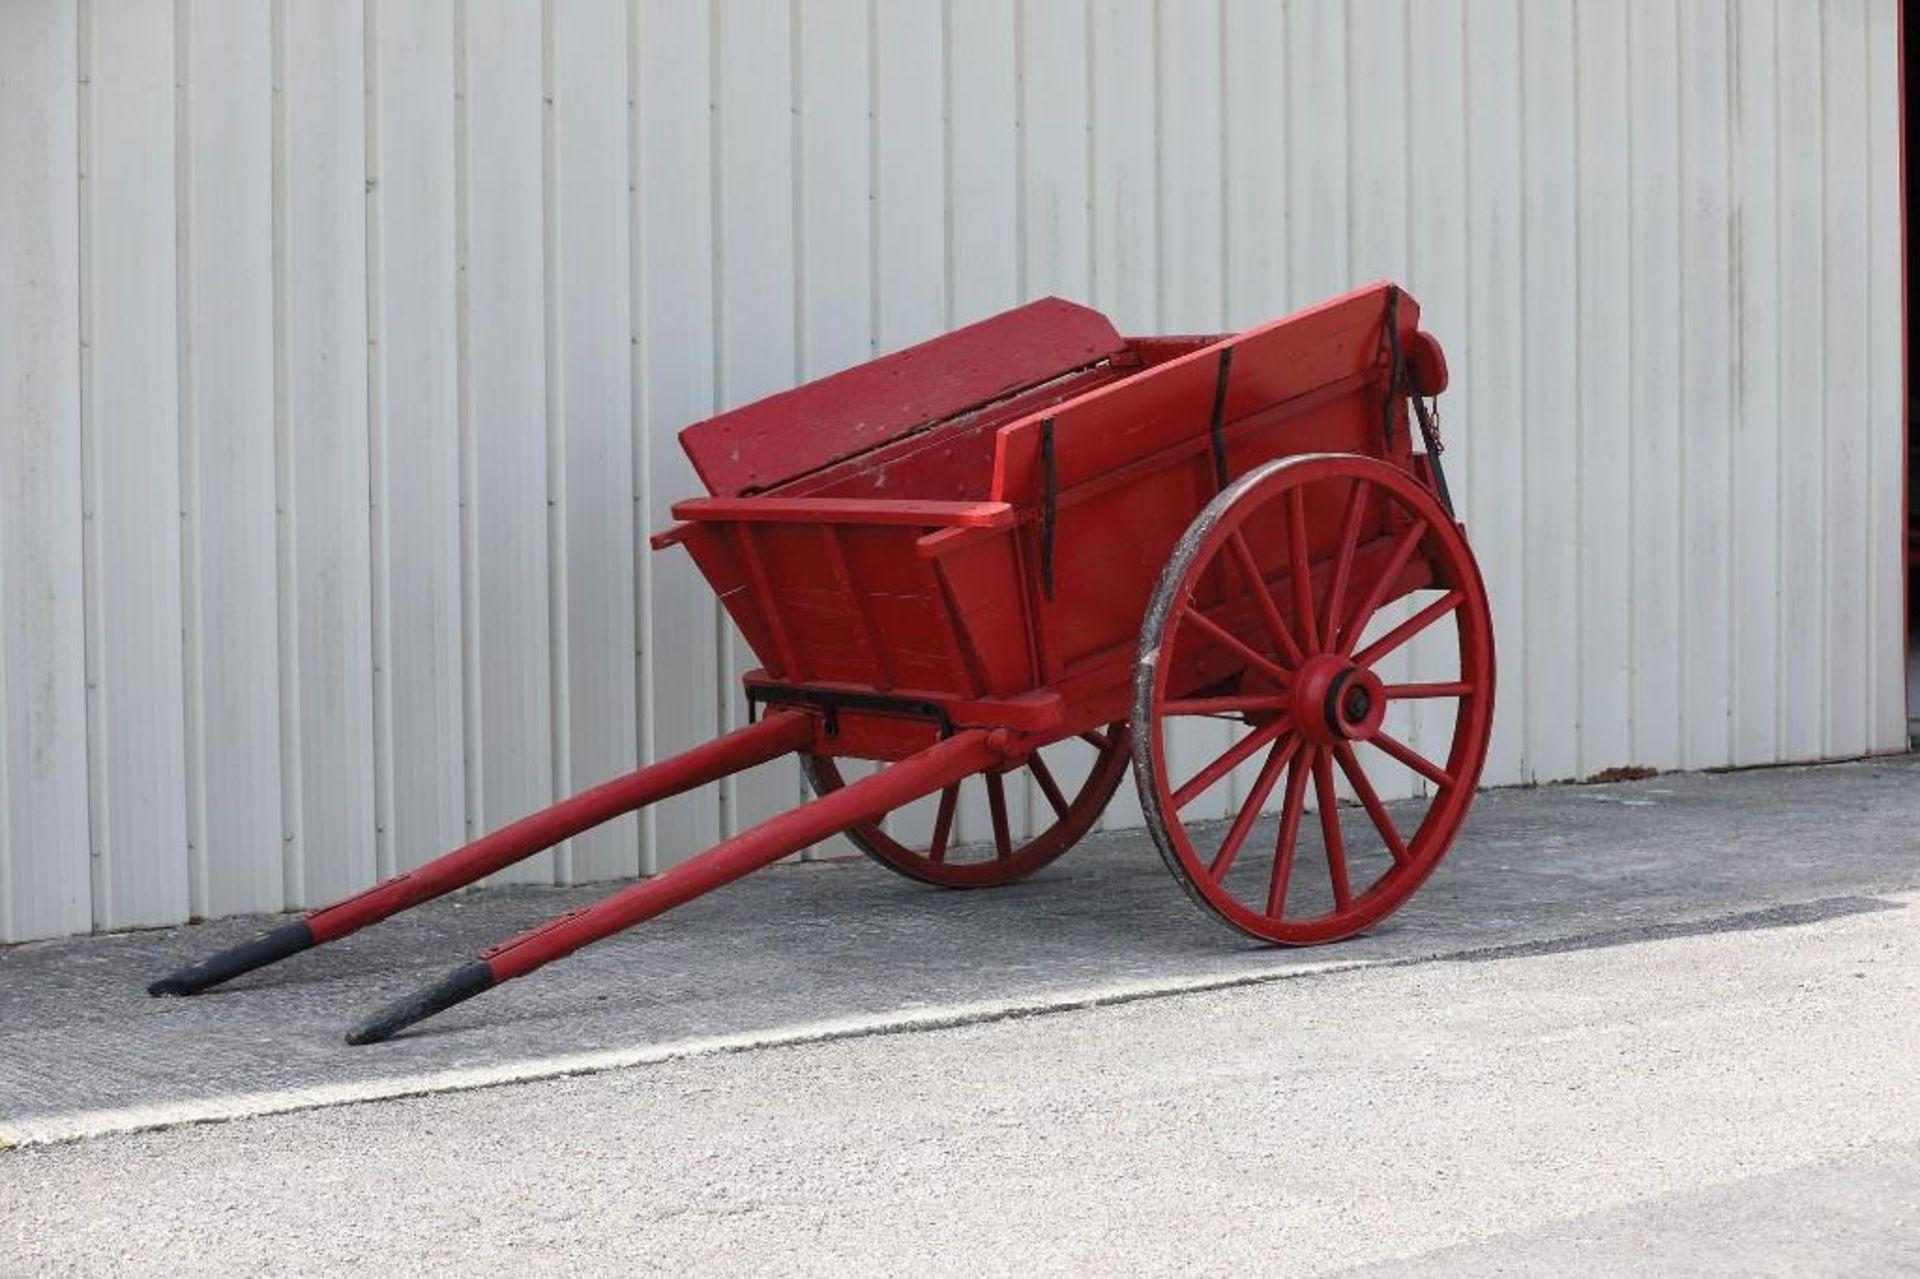 Original 2-Wheel Farm Dump Cart - Image 2 of 2